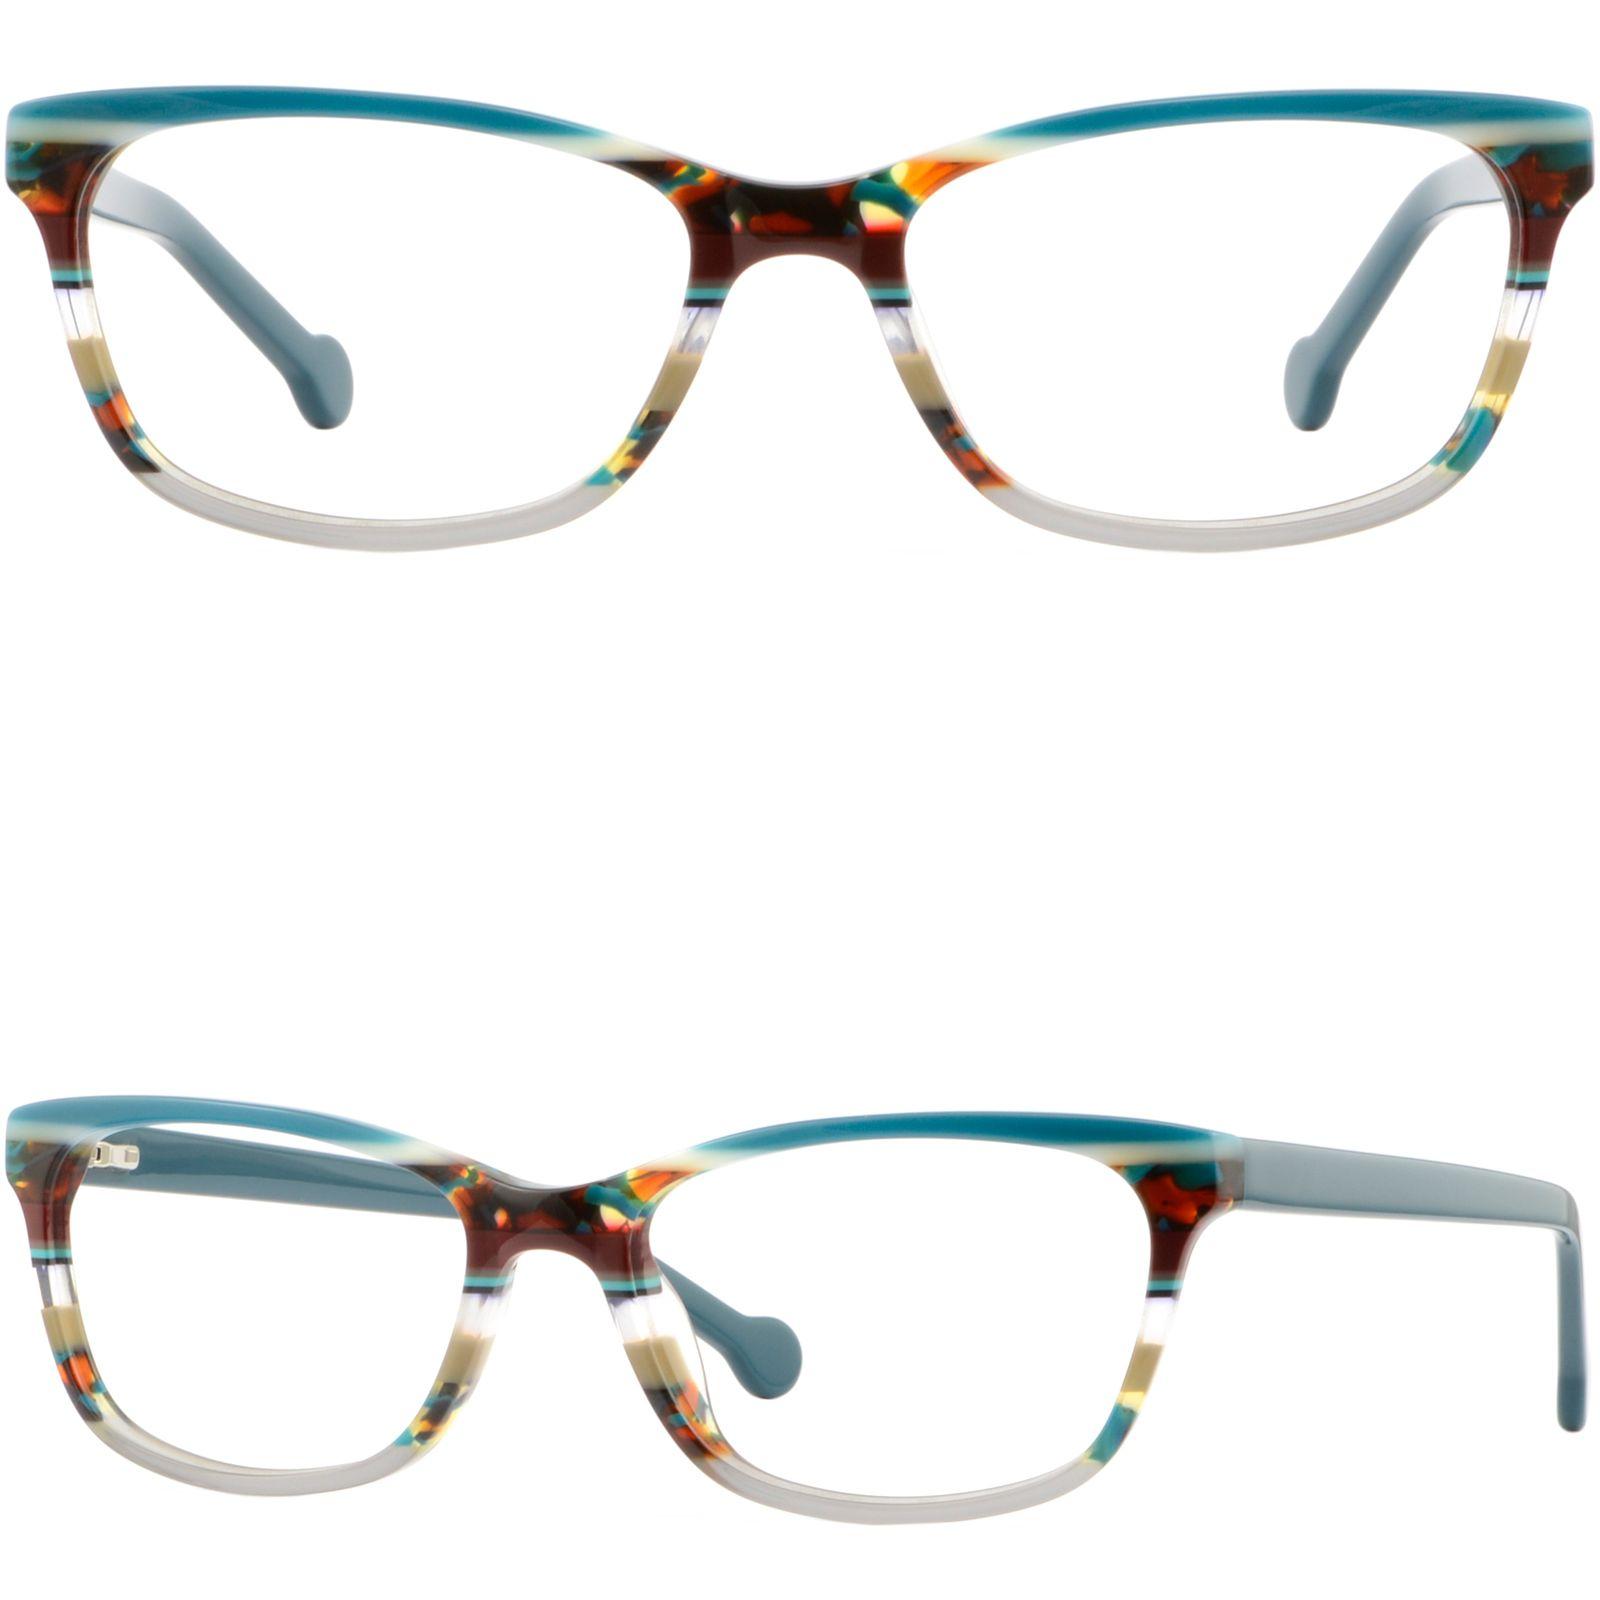 Acetate Plastic Frames Prescription Glasses Spring Hinges Sunglasses  Turquoise